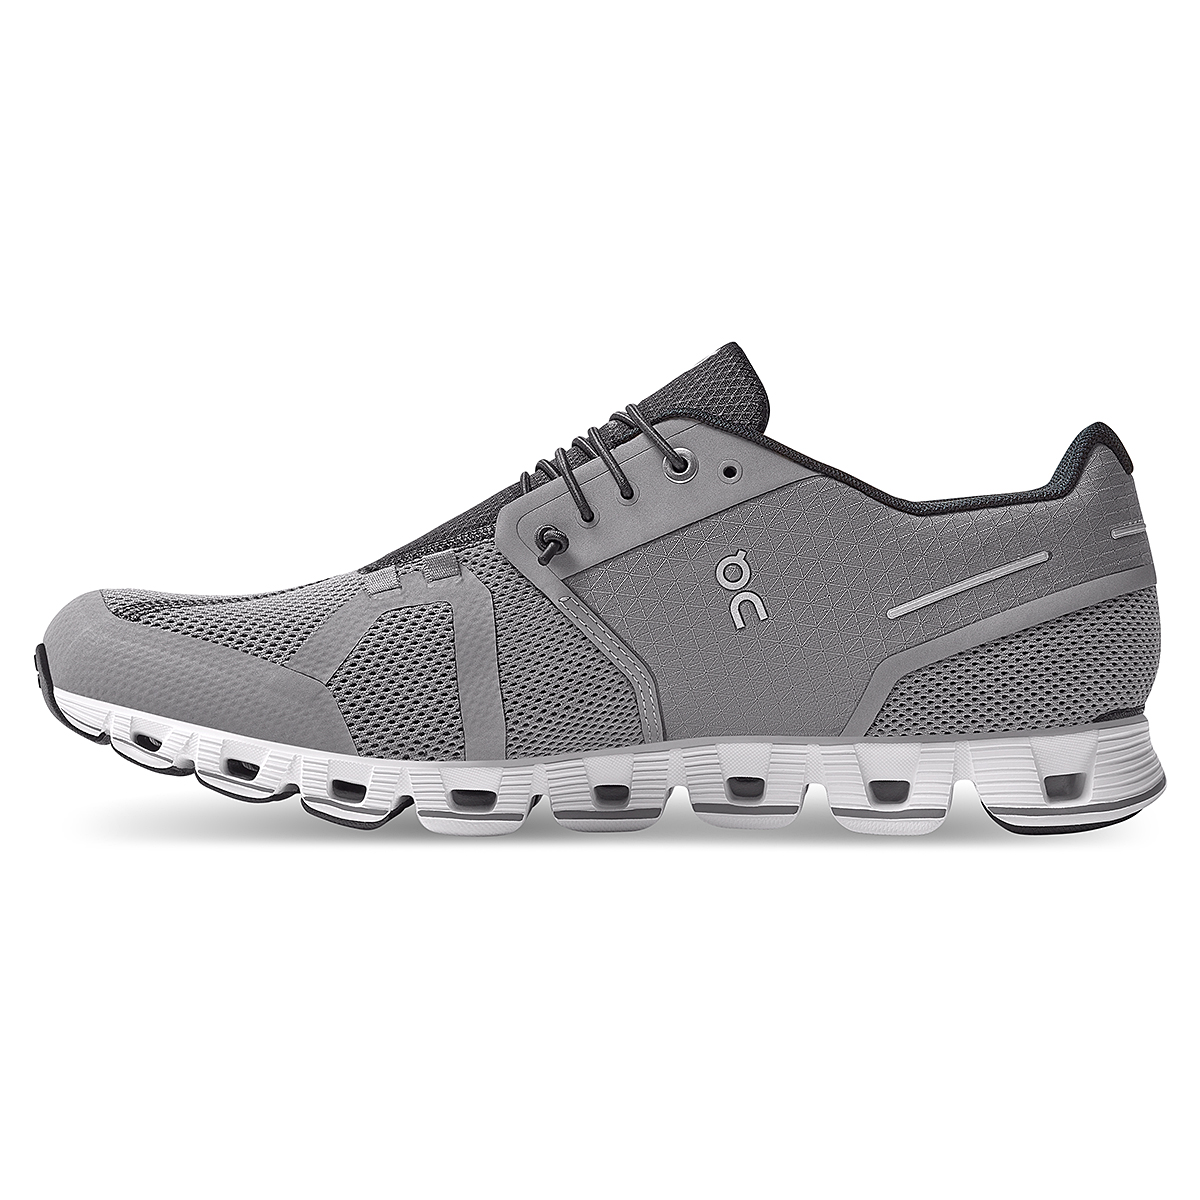 Men's On Cloud Running Shoe - Color: Zinc/White - Size: 7 - Width: Regular, Zinc/White, large, image 3